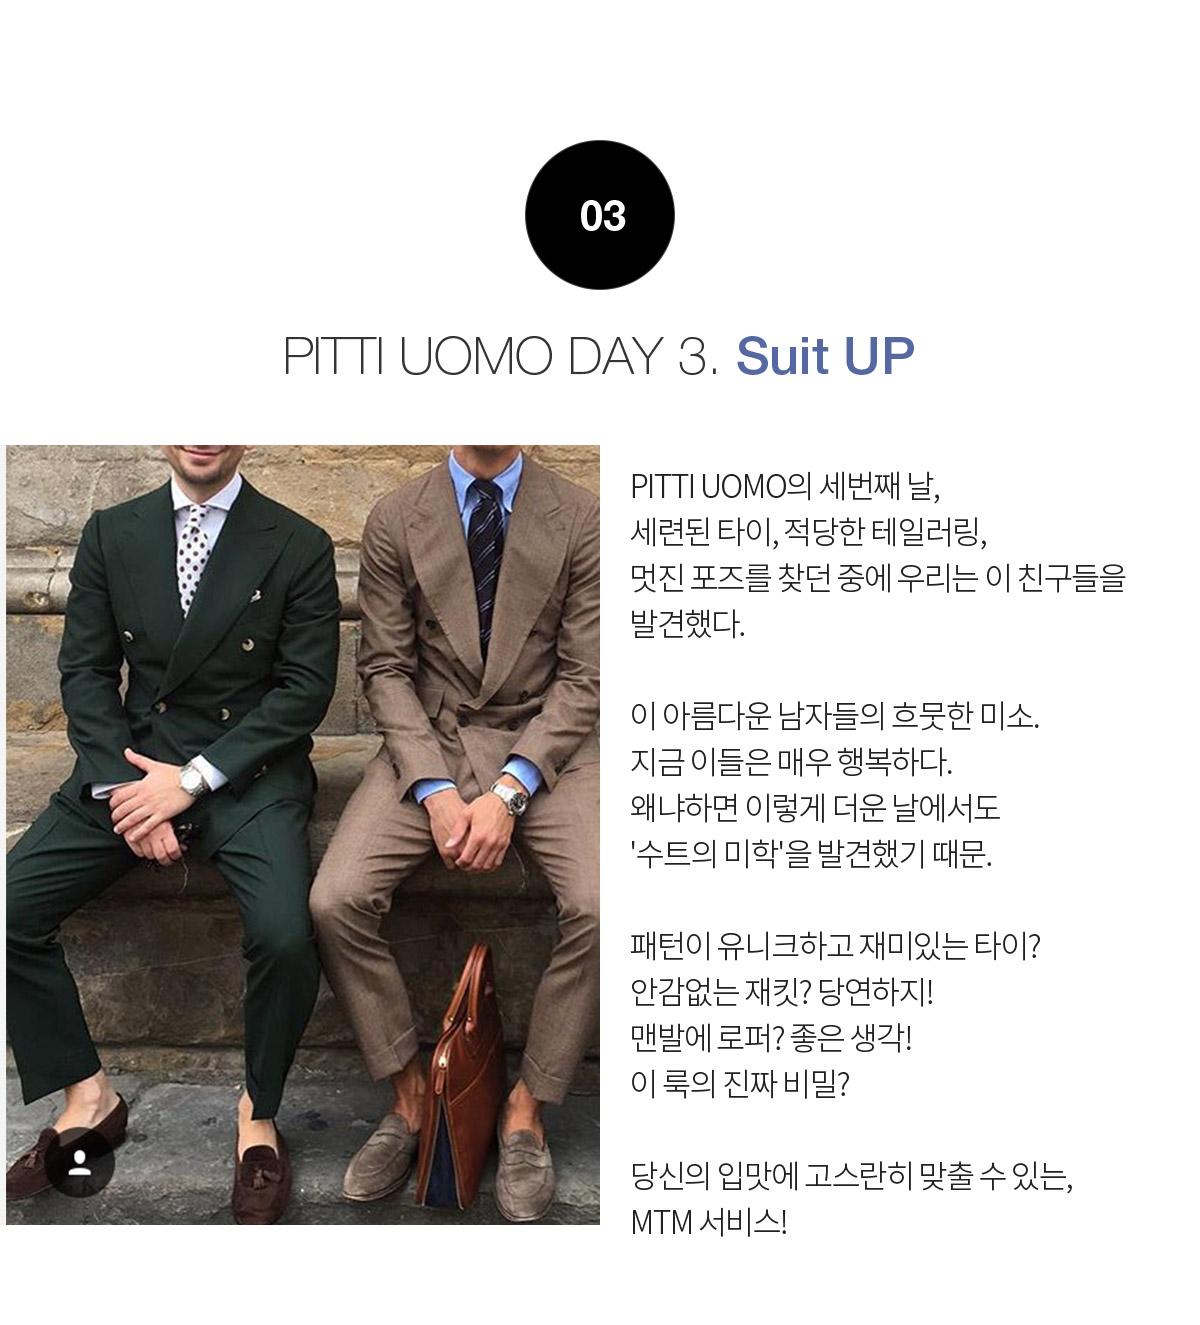 PITTI UOMO DAY 3. Suit UP